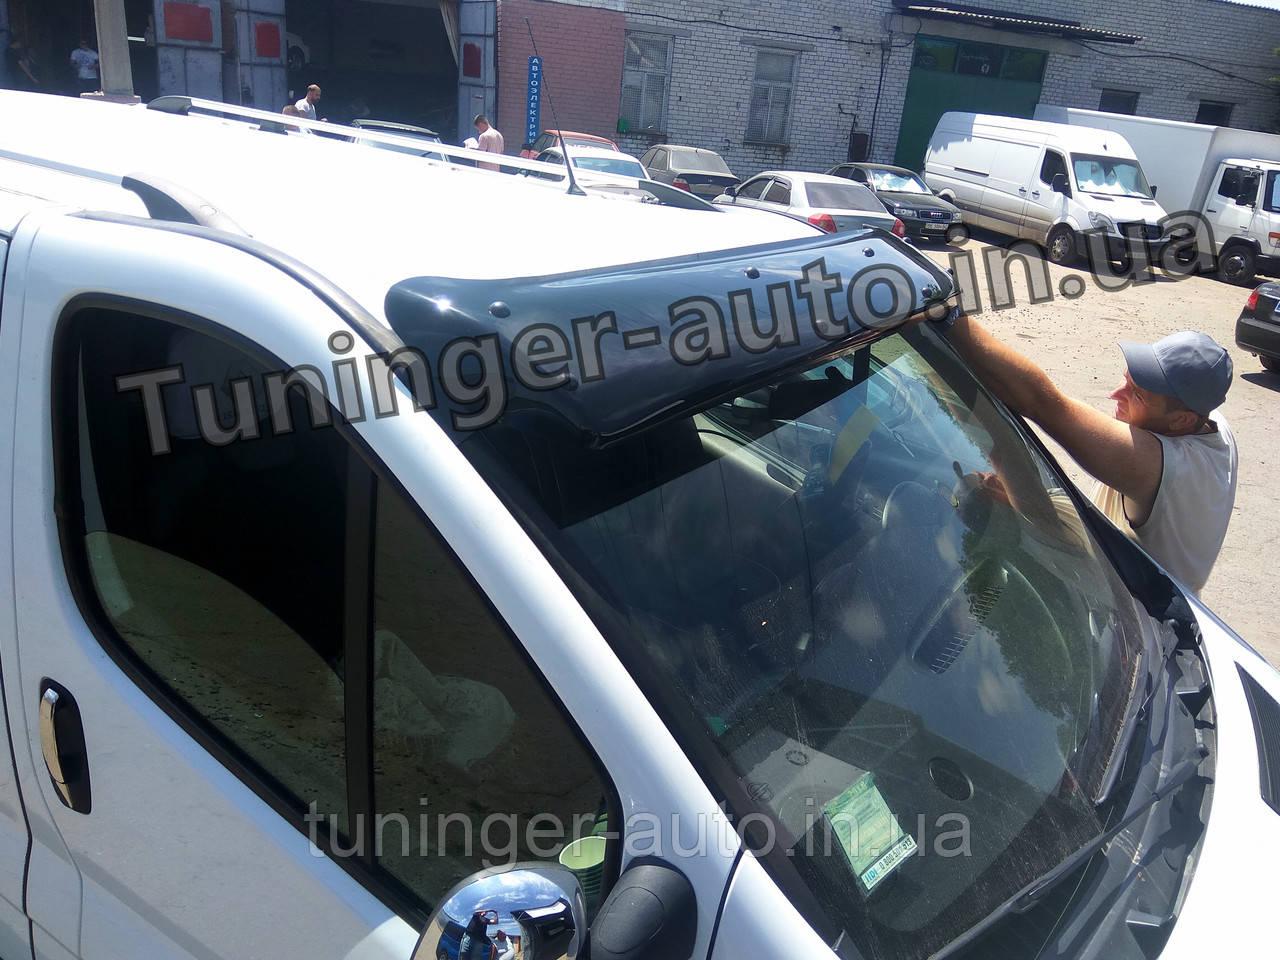 Козырек на лобовое стекло Renault Trafic/Opel Vivaro 2001-2013 (Турецкий)